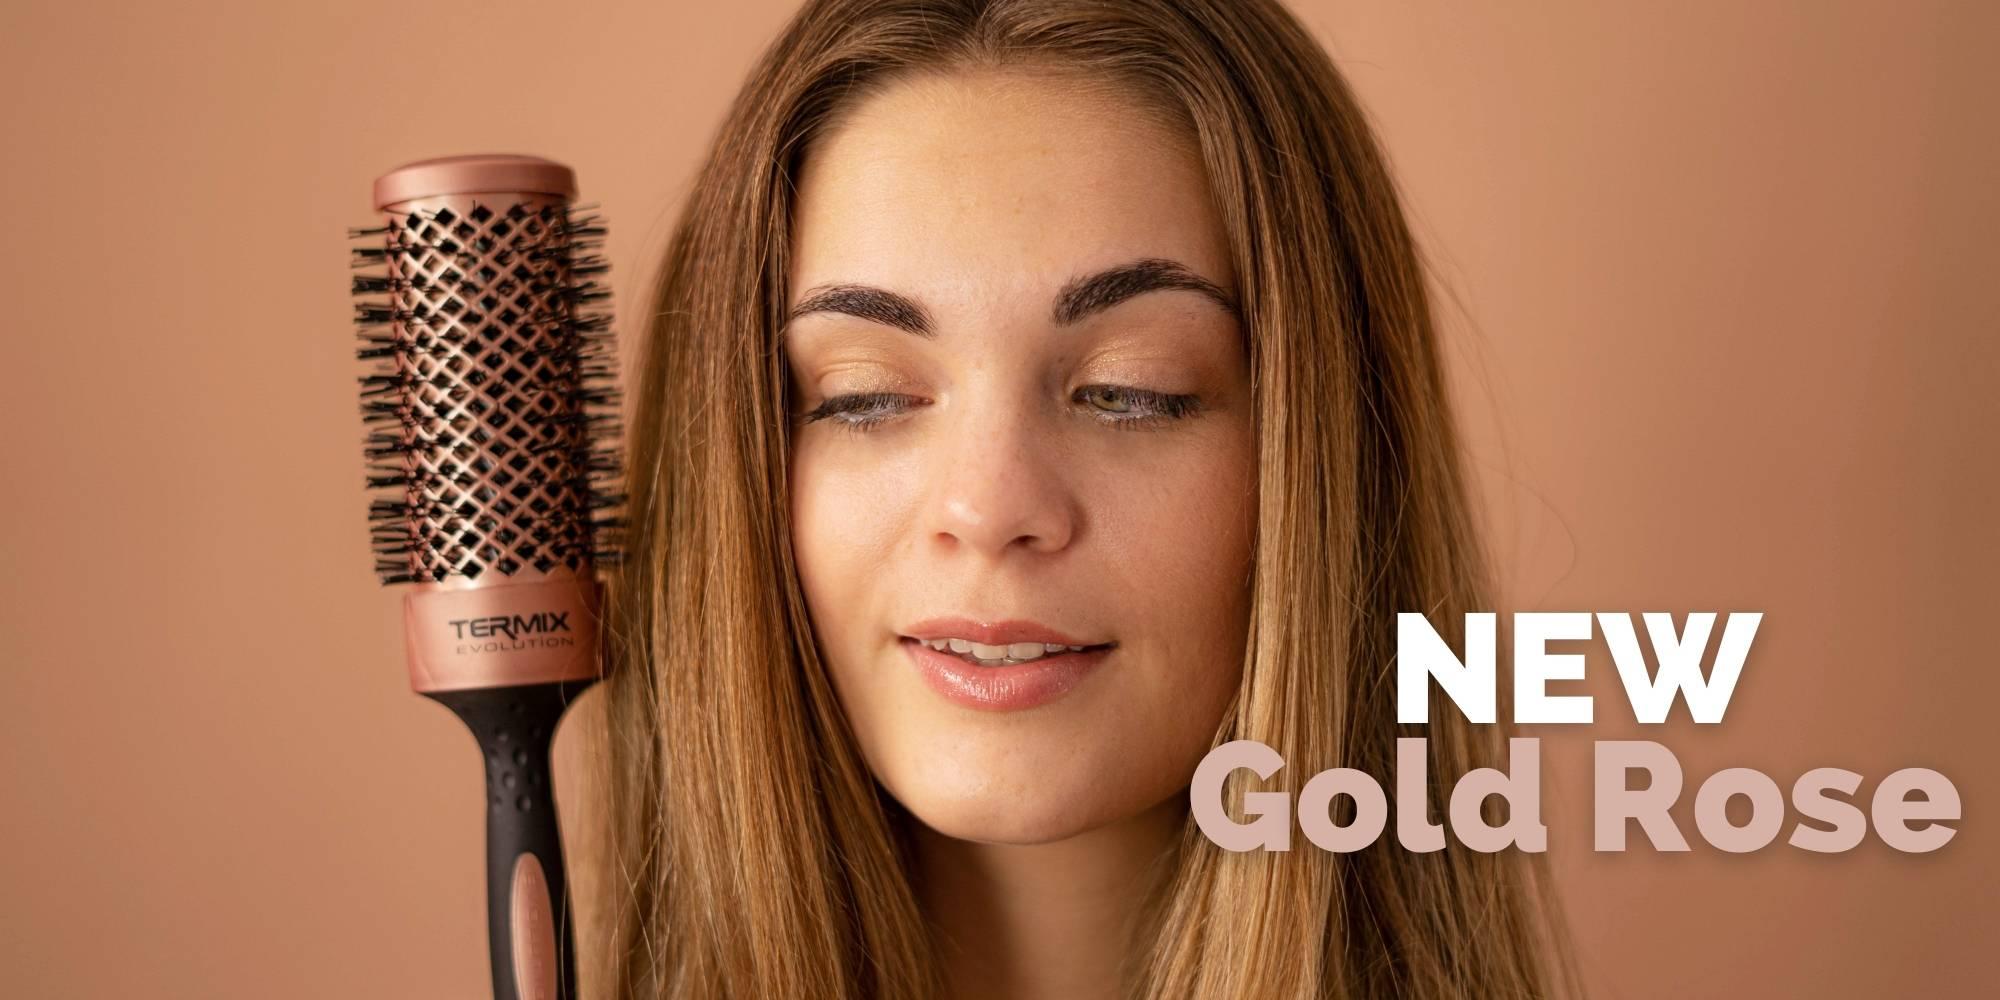 New Termix Evolution Gold Rose brushes